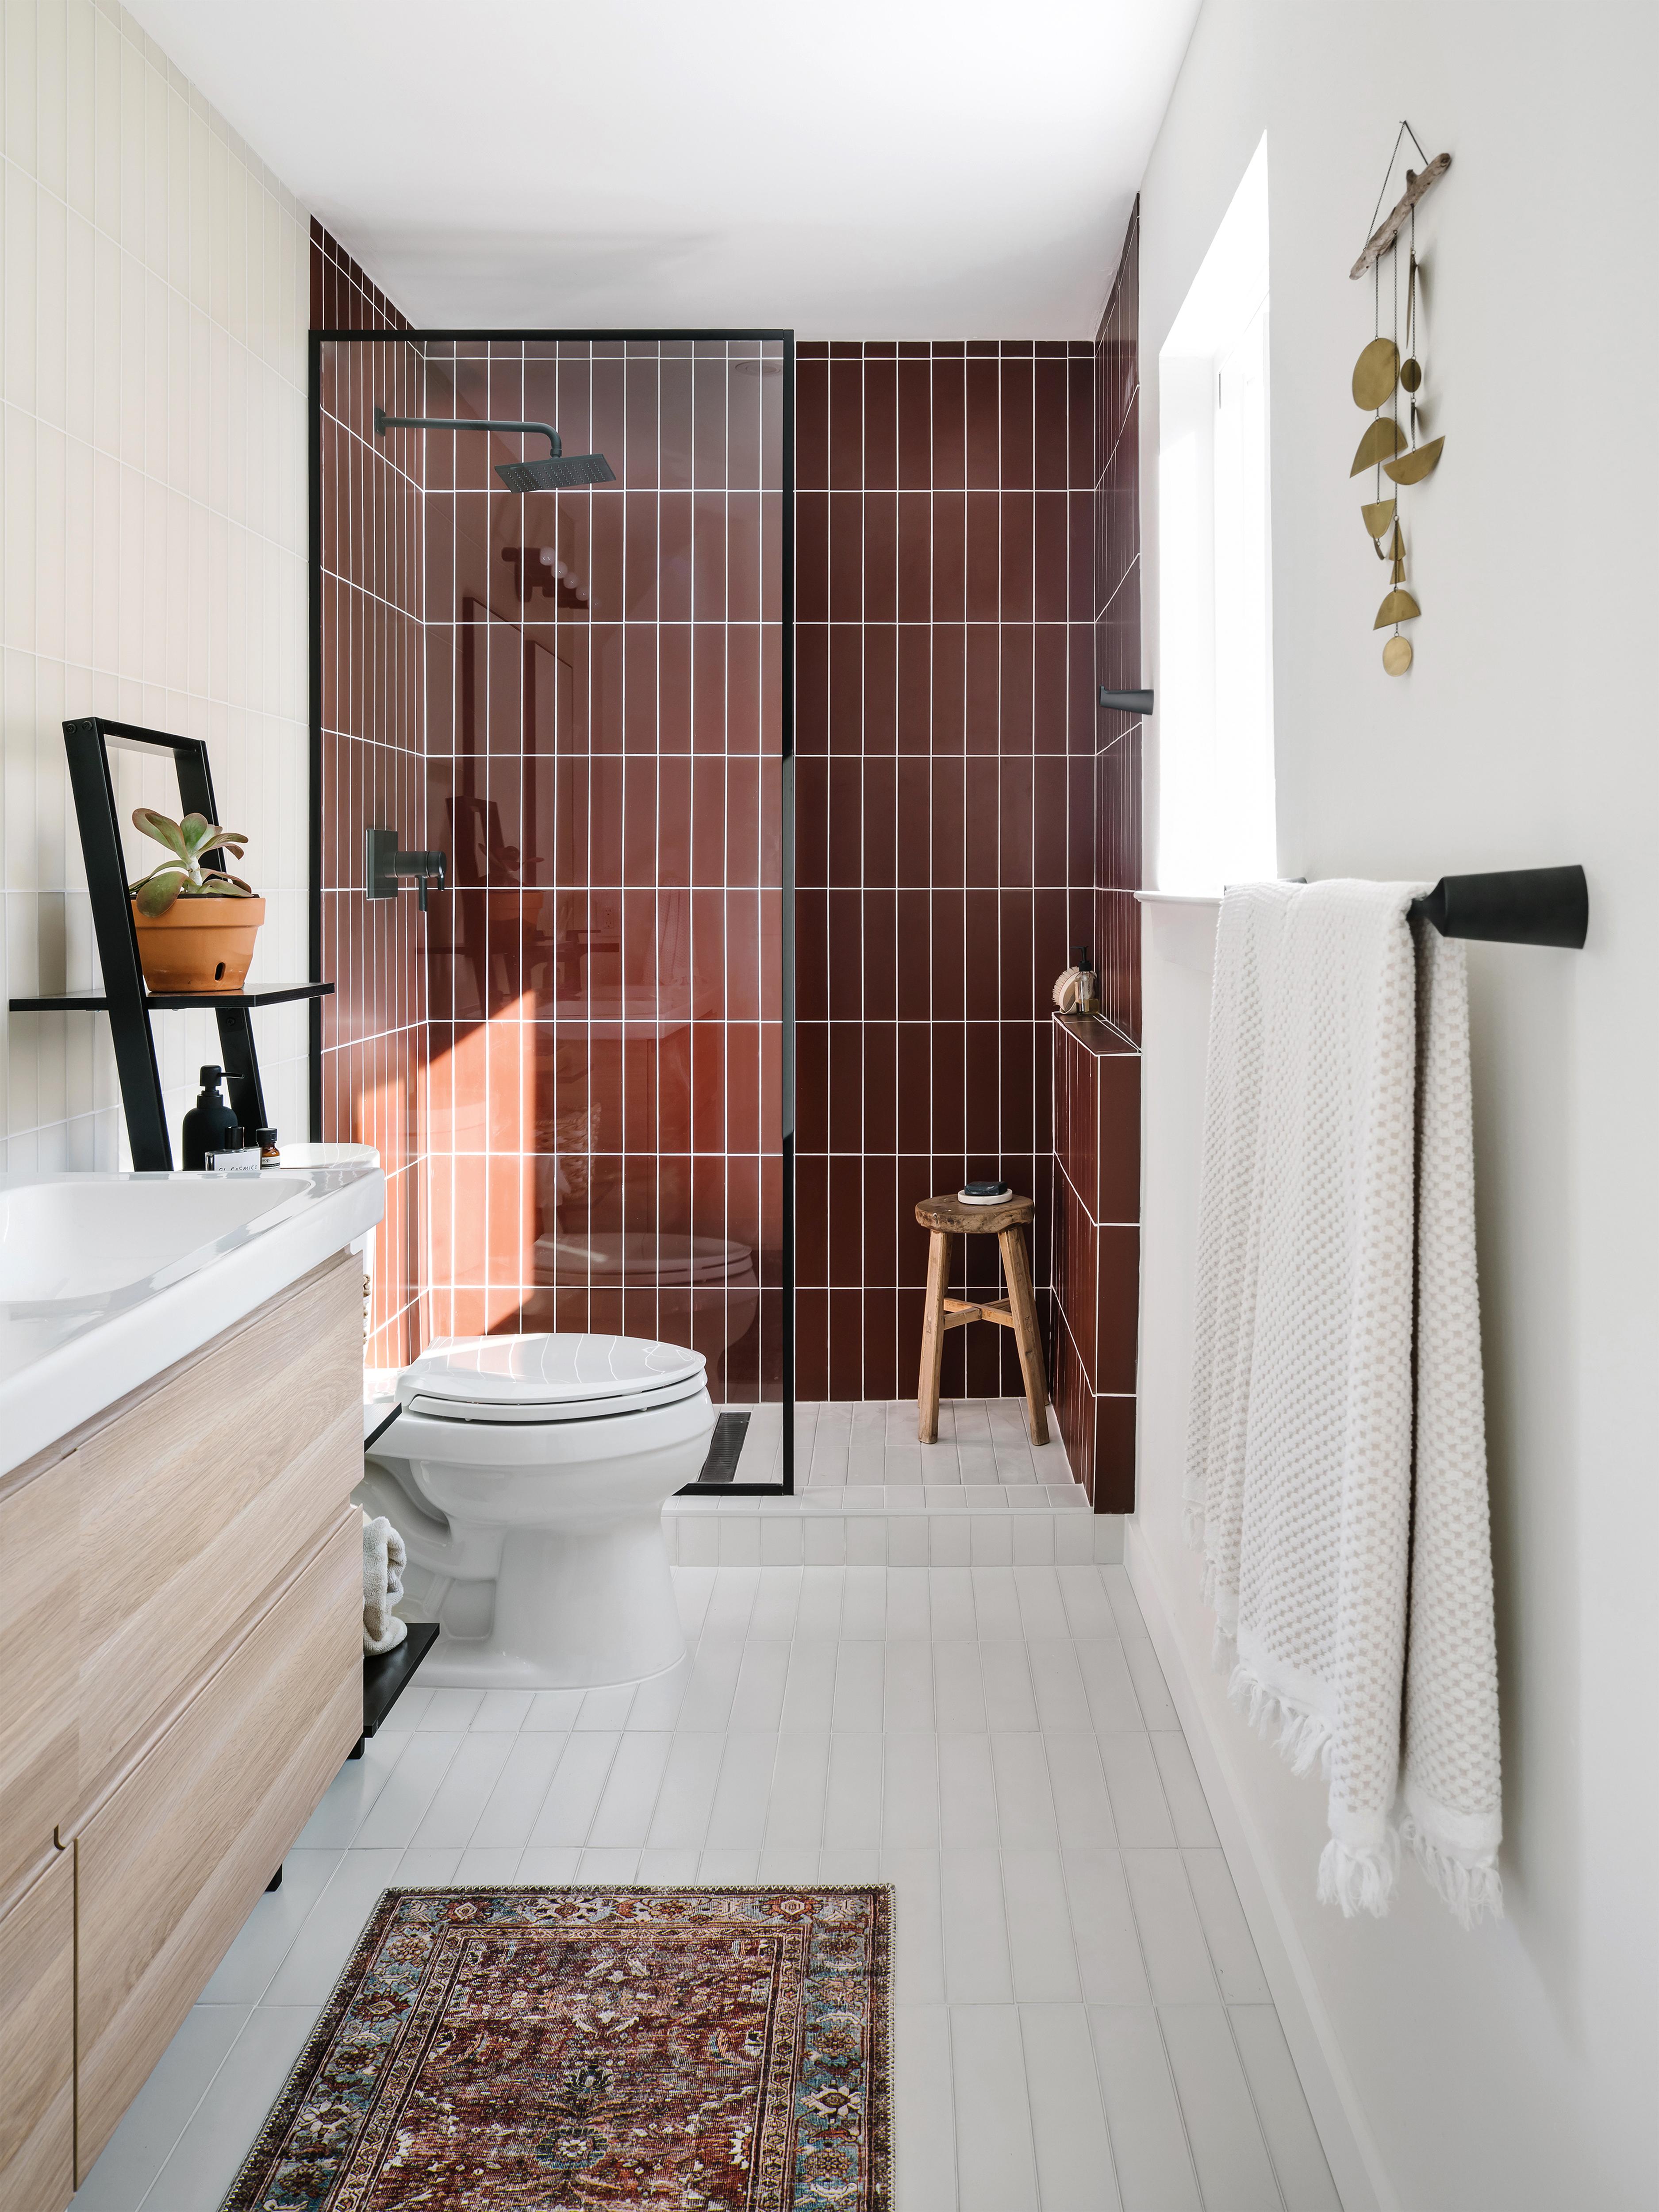 GALLERY_2019_Q2_image_residential_full-rights_influencer_design_photo_chase-daniel_bathroom_shower_walls_glass_pheasant-matte_sparrow-matte_3x12_floor_tile_3x12_halite_vertical_straight-set_FC-263094_FC-263091.jpg?mtime=20190507155606#asset:451443